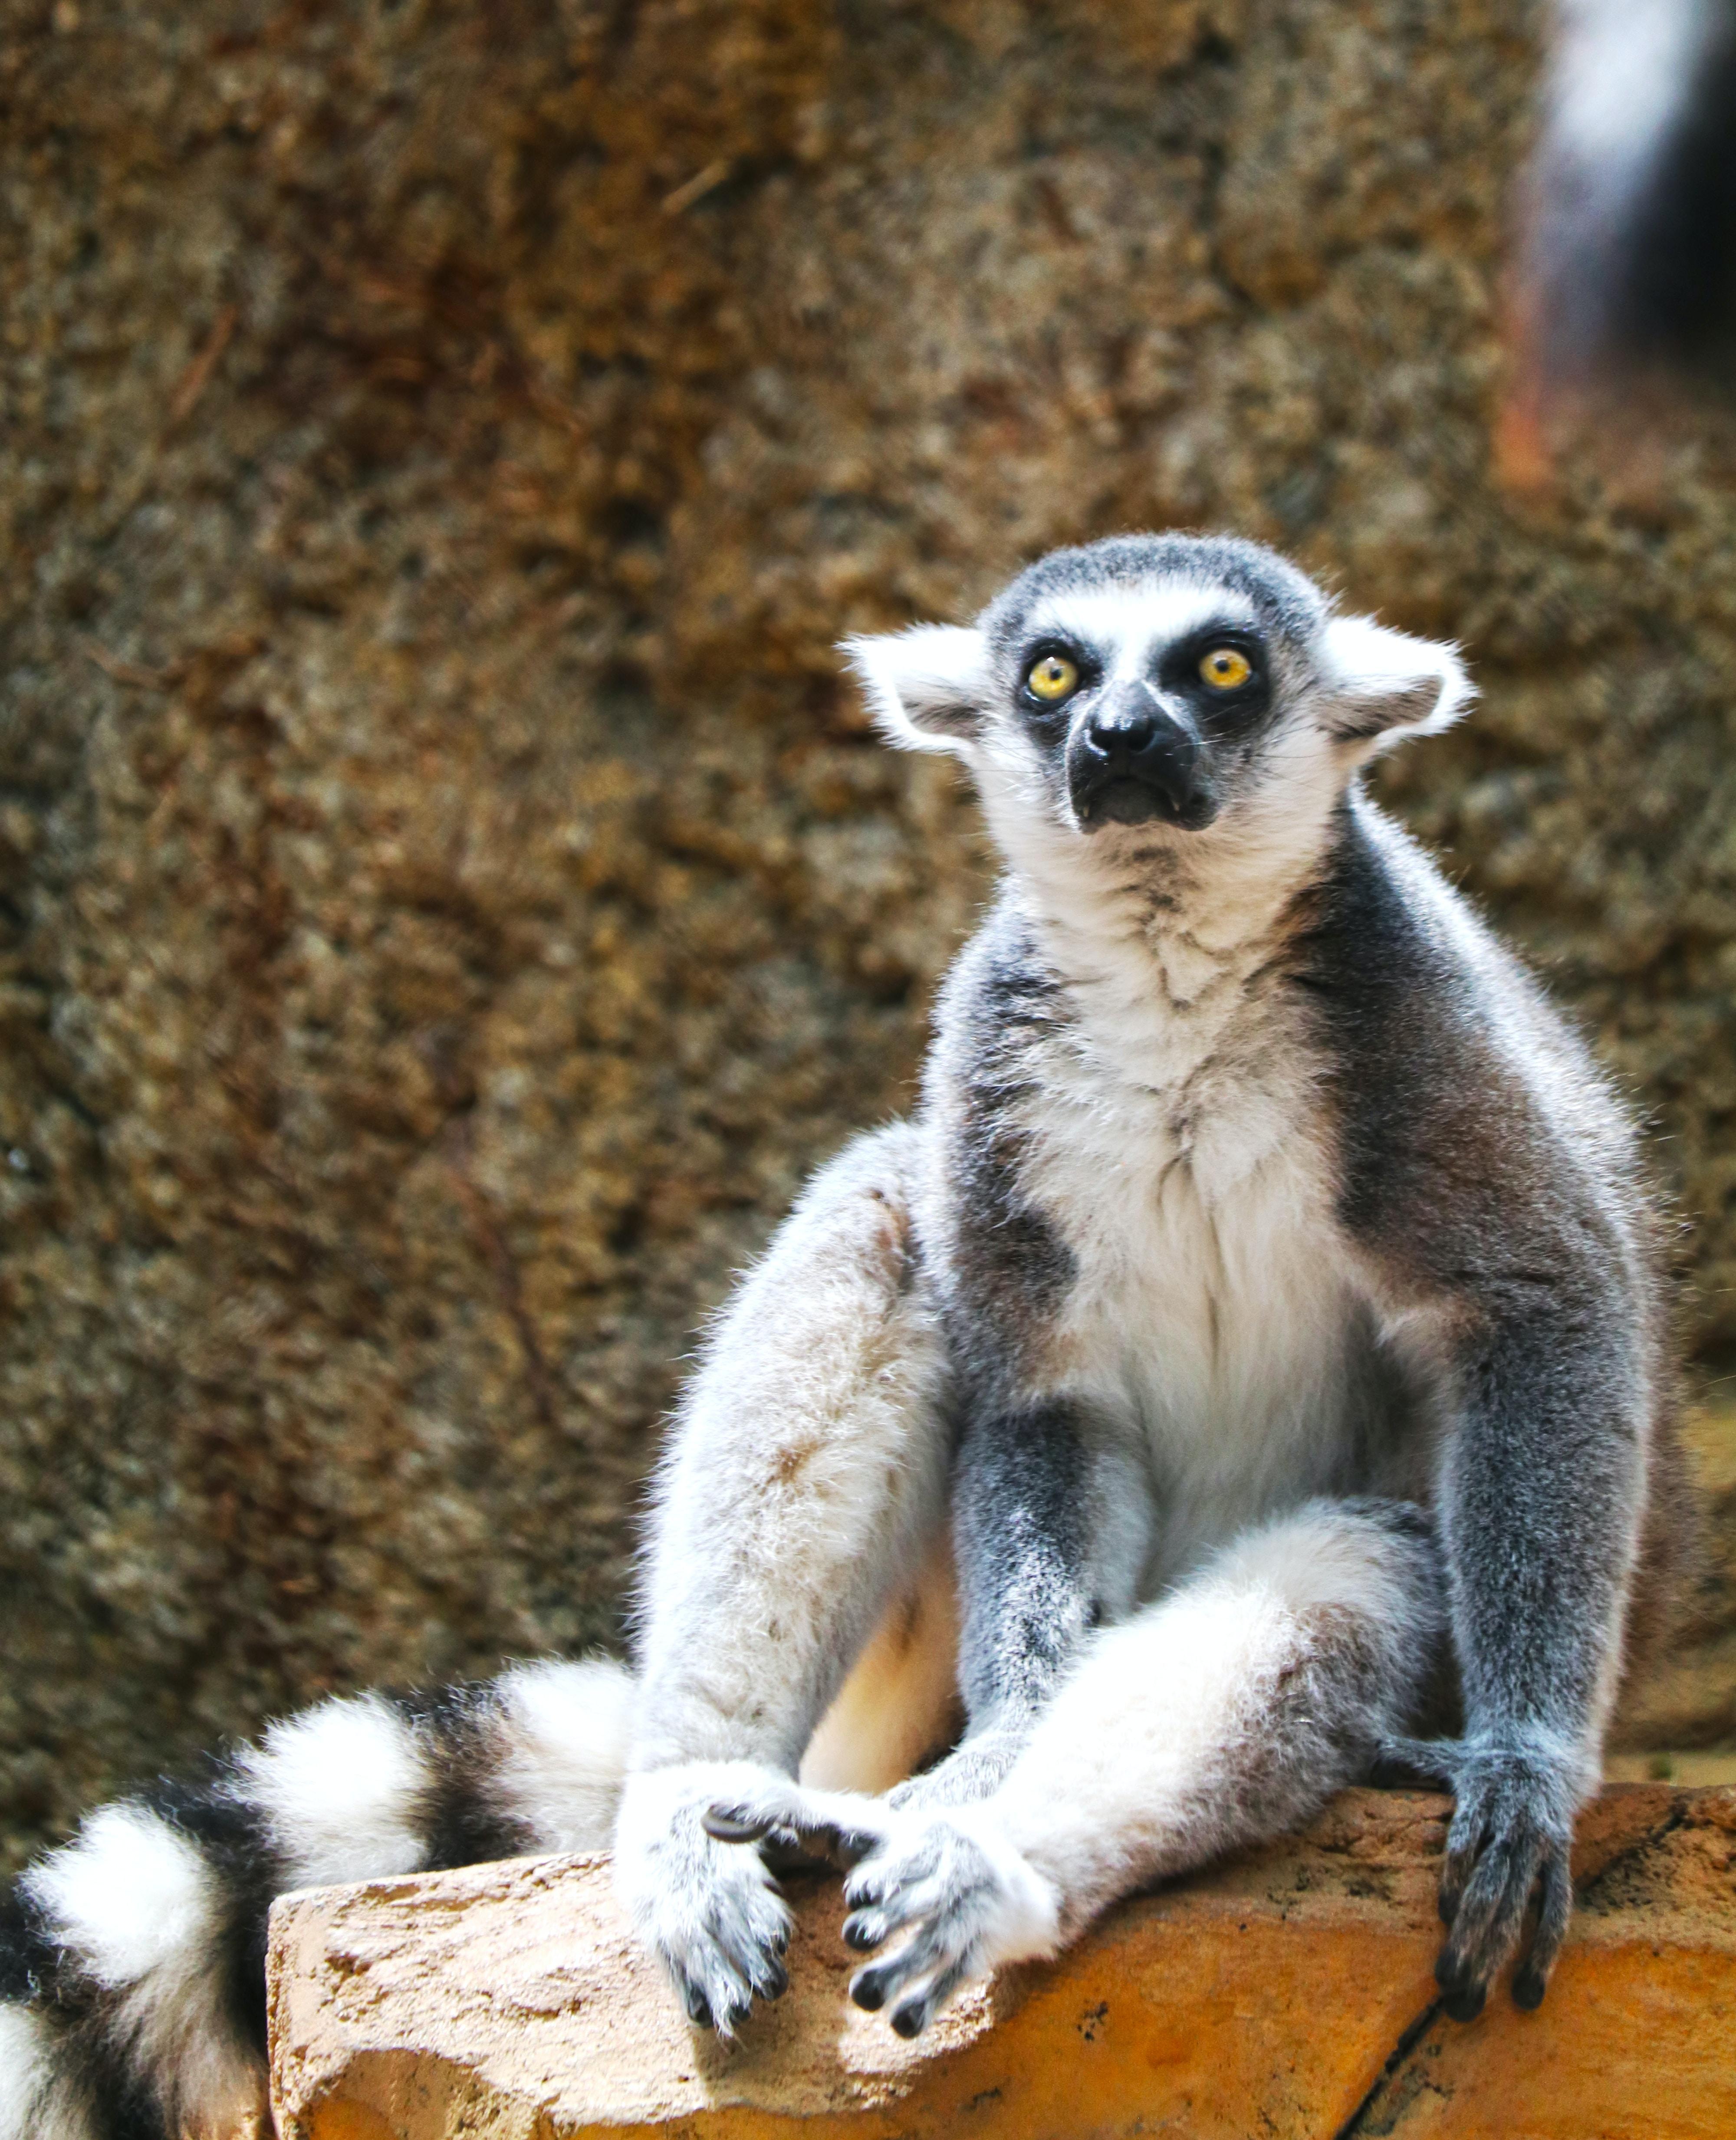 black and white lemur sitting down on brown rock